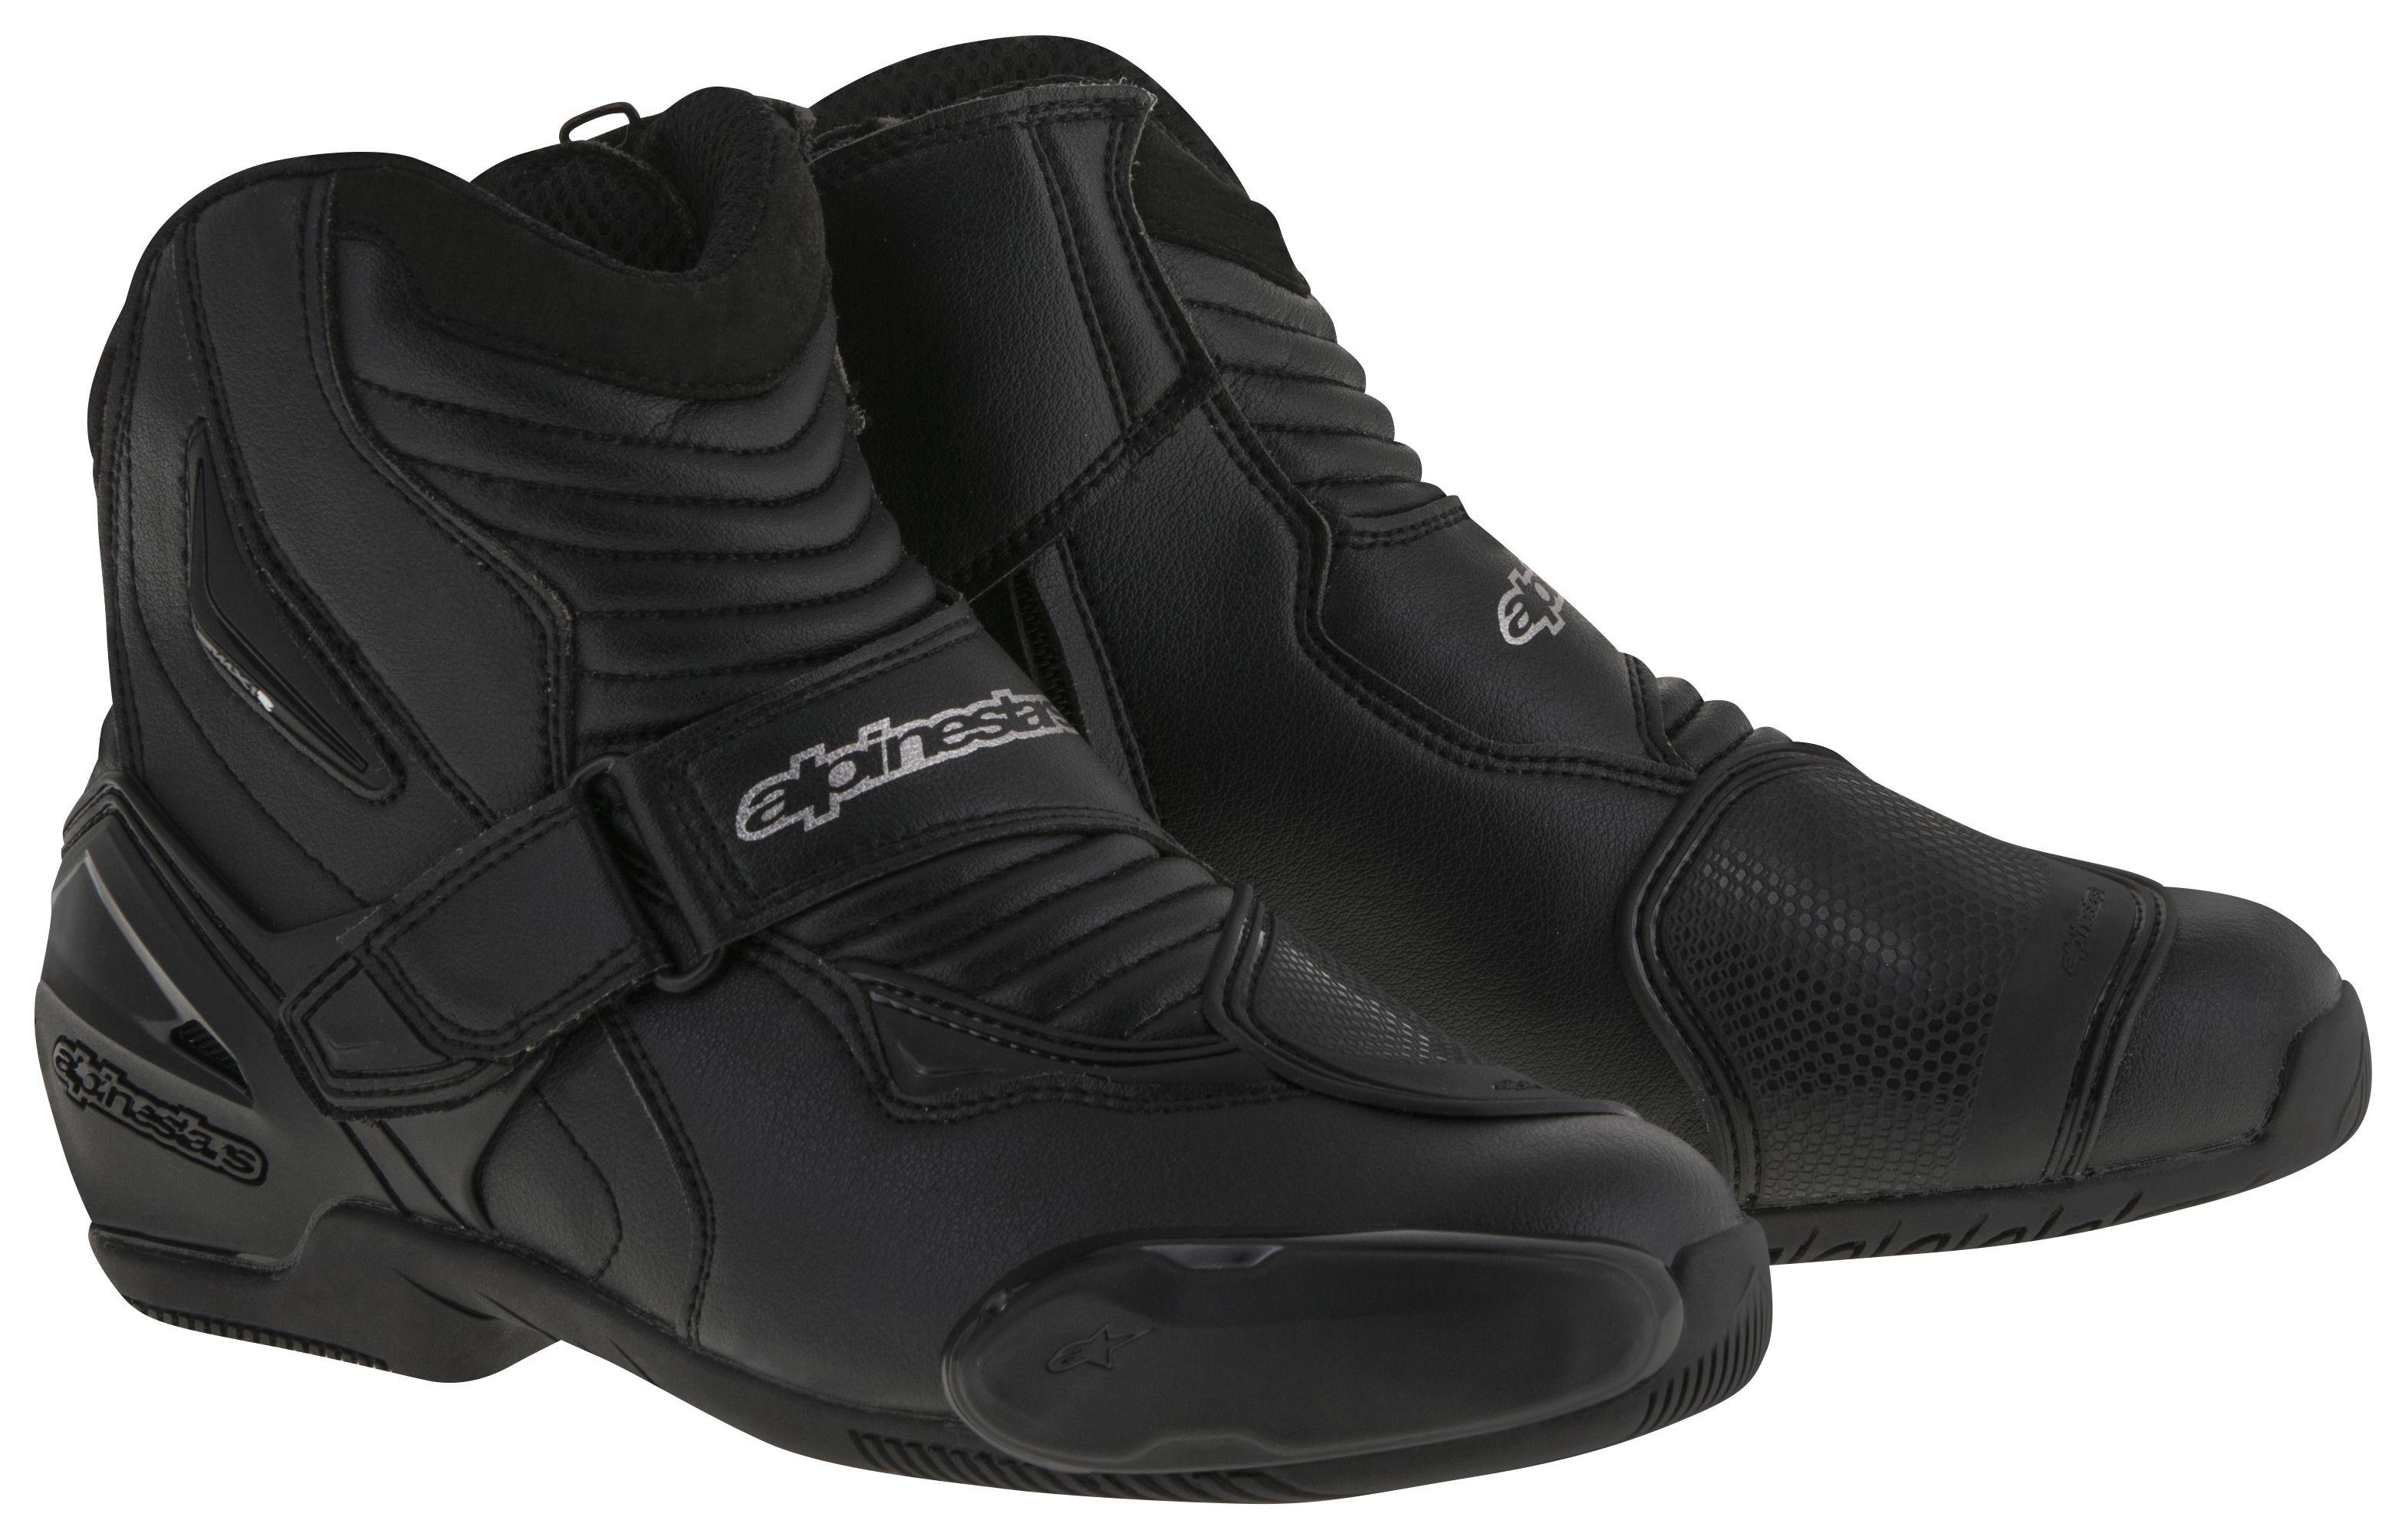 Alpinestars Smx 1 R Boots Revzilla